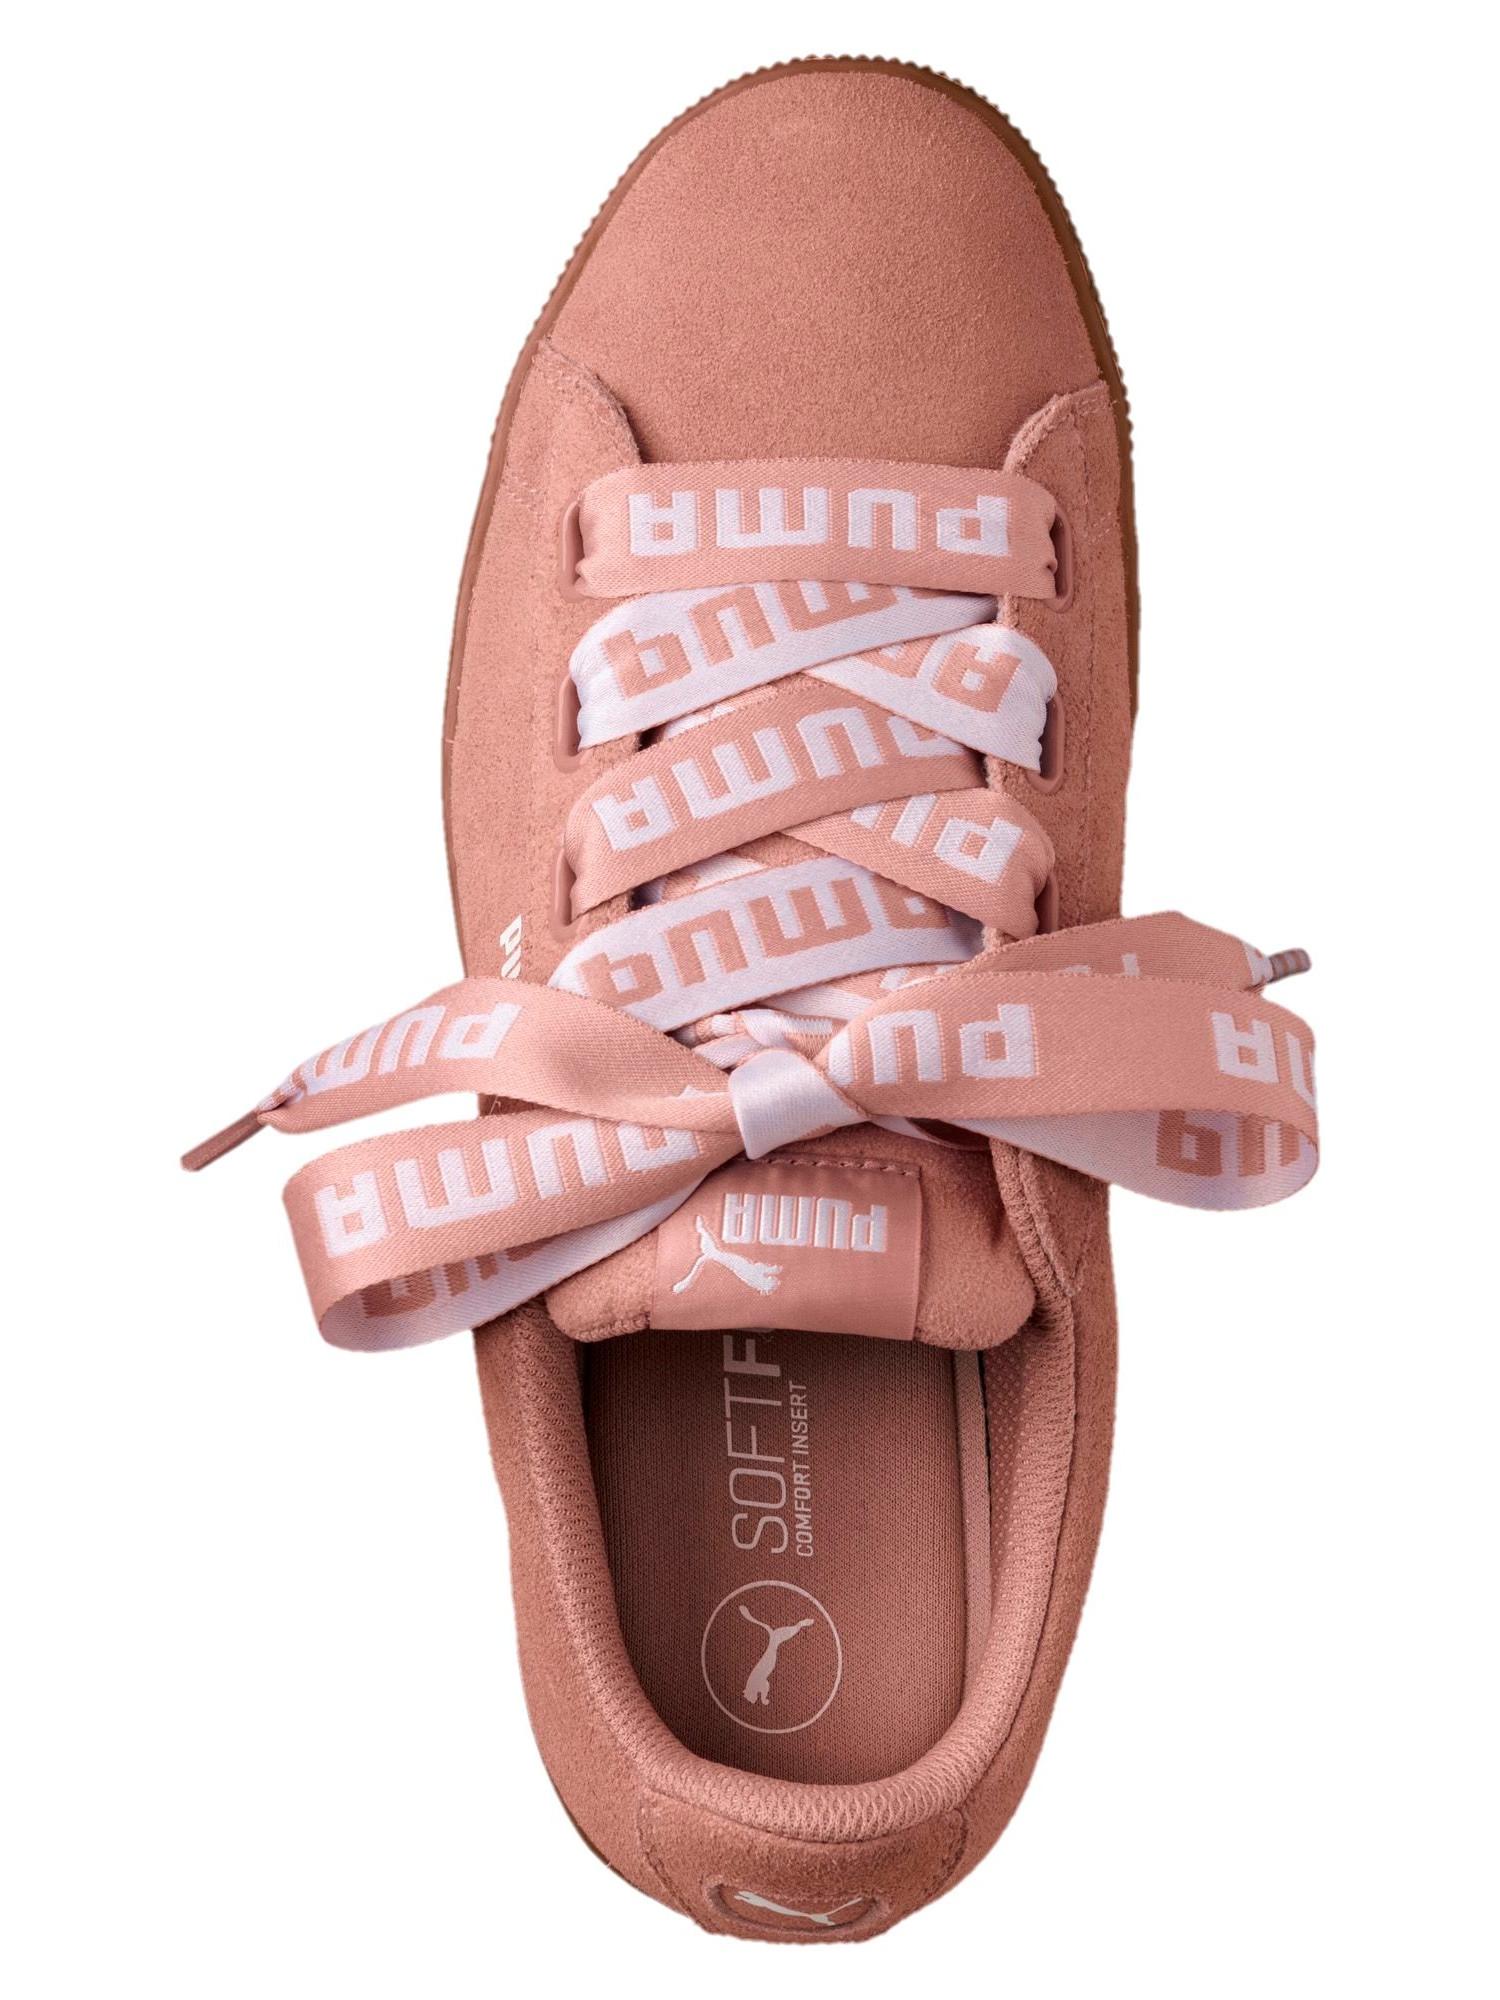 Puma Schuhe Sportive Sneakers Vikky Pltfm Rosa Ribbon Bold Rihanna Damenschuhe Rosa Pltfm 60a8ef